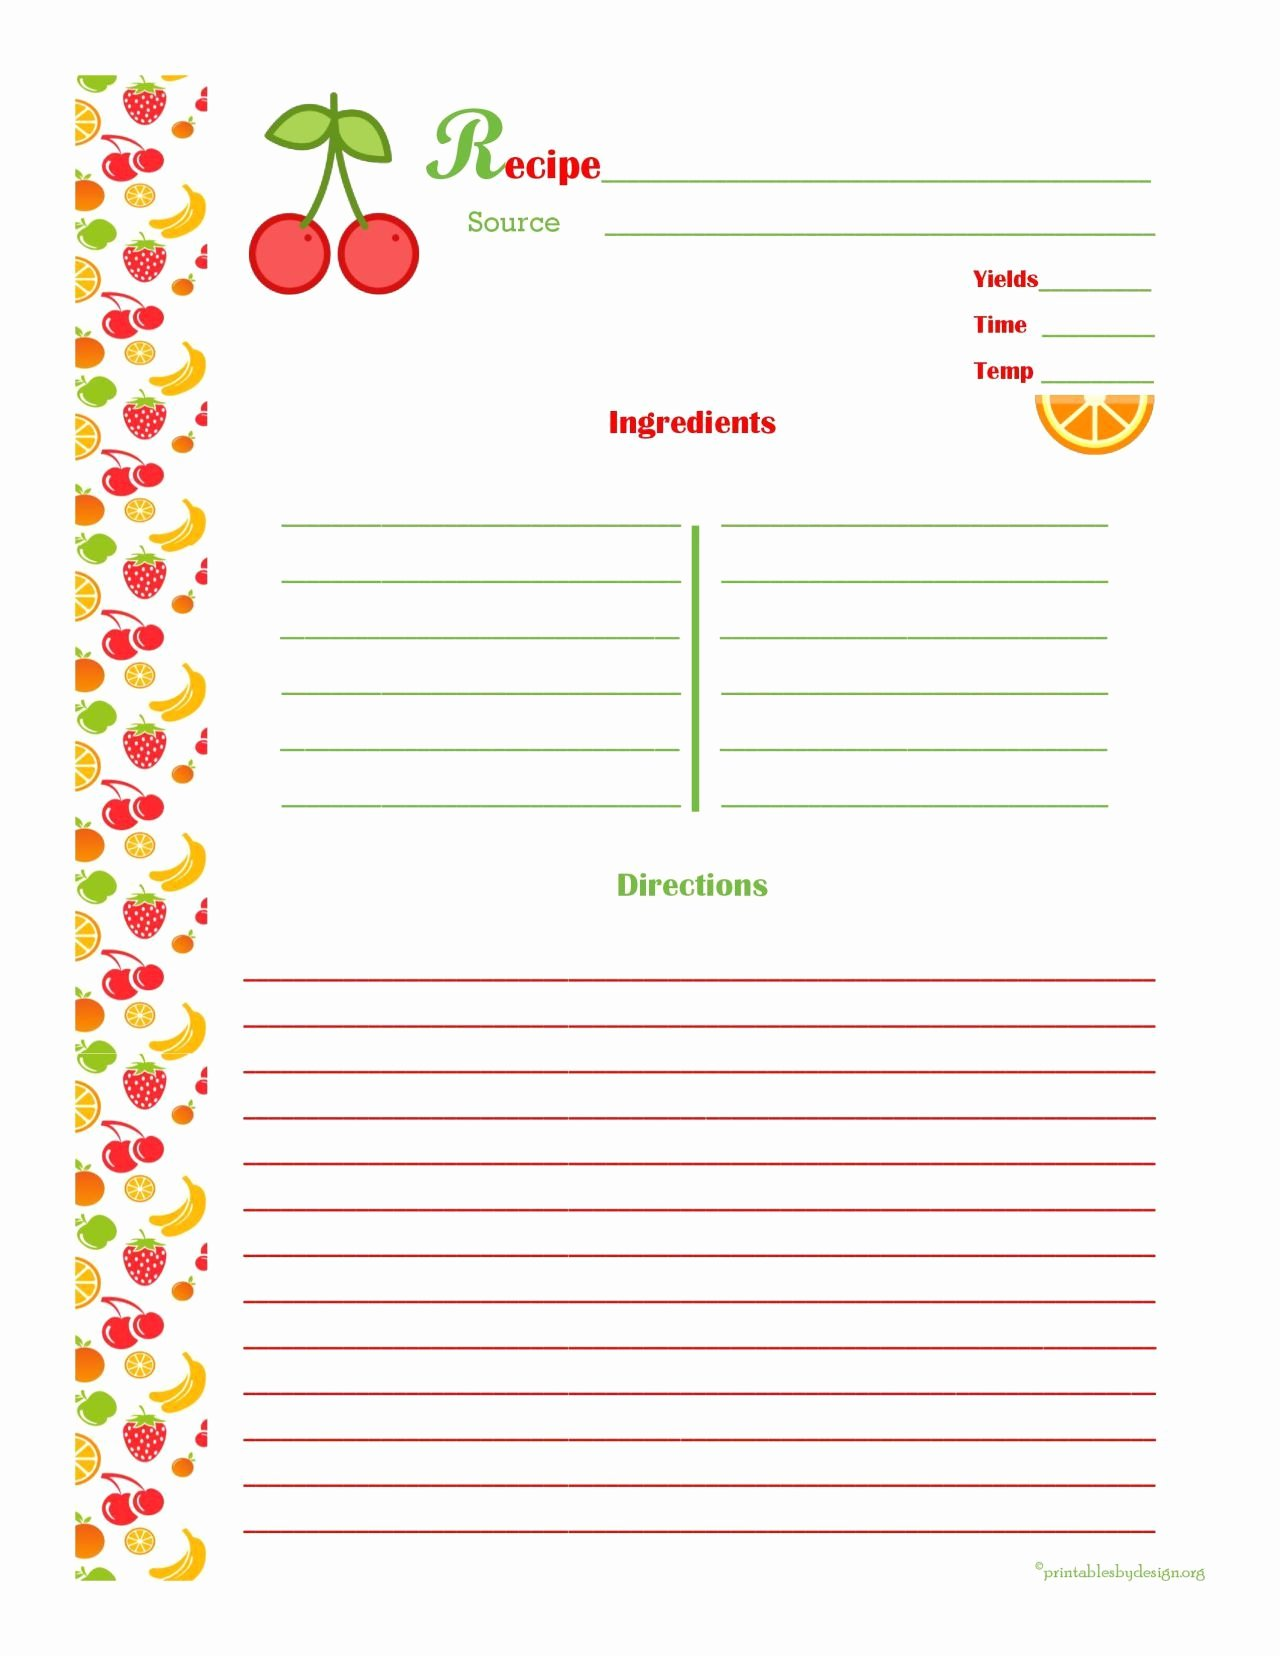 Free Editable Recipe Card Templates for Microsoft Word Fresh Free Editable Recipe Card Templates for Microsoft Word